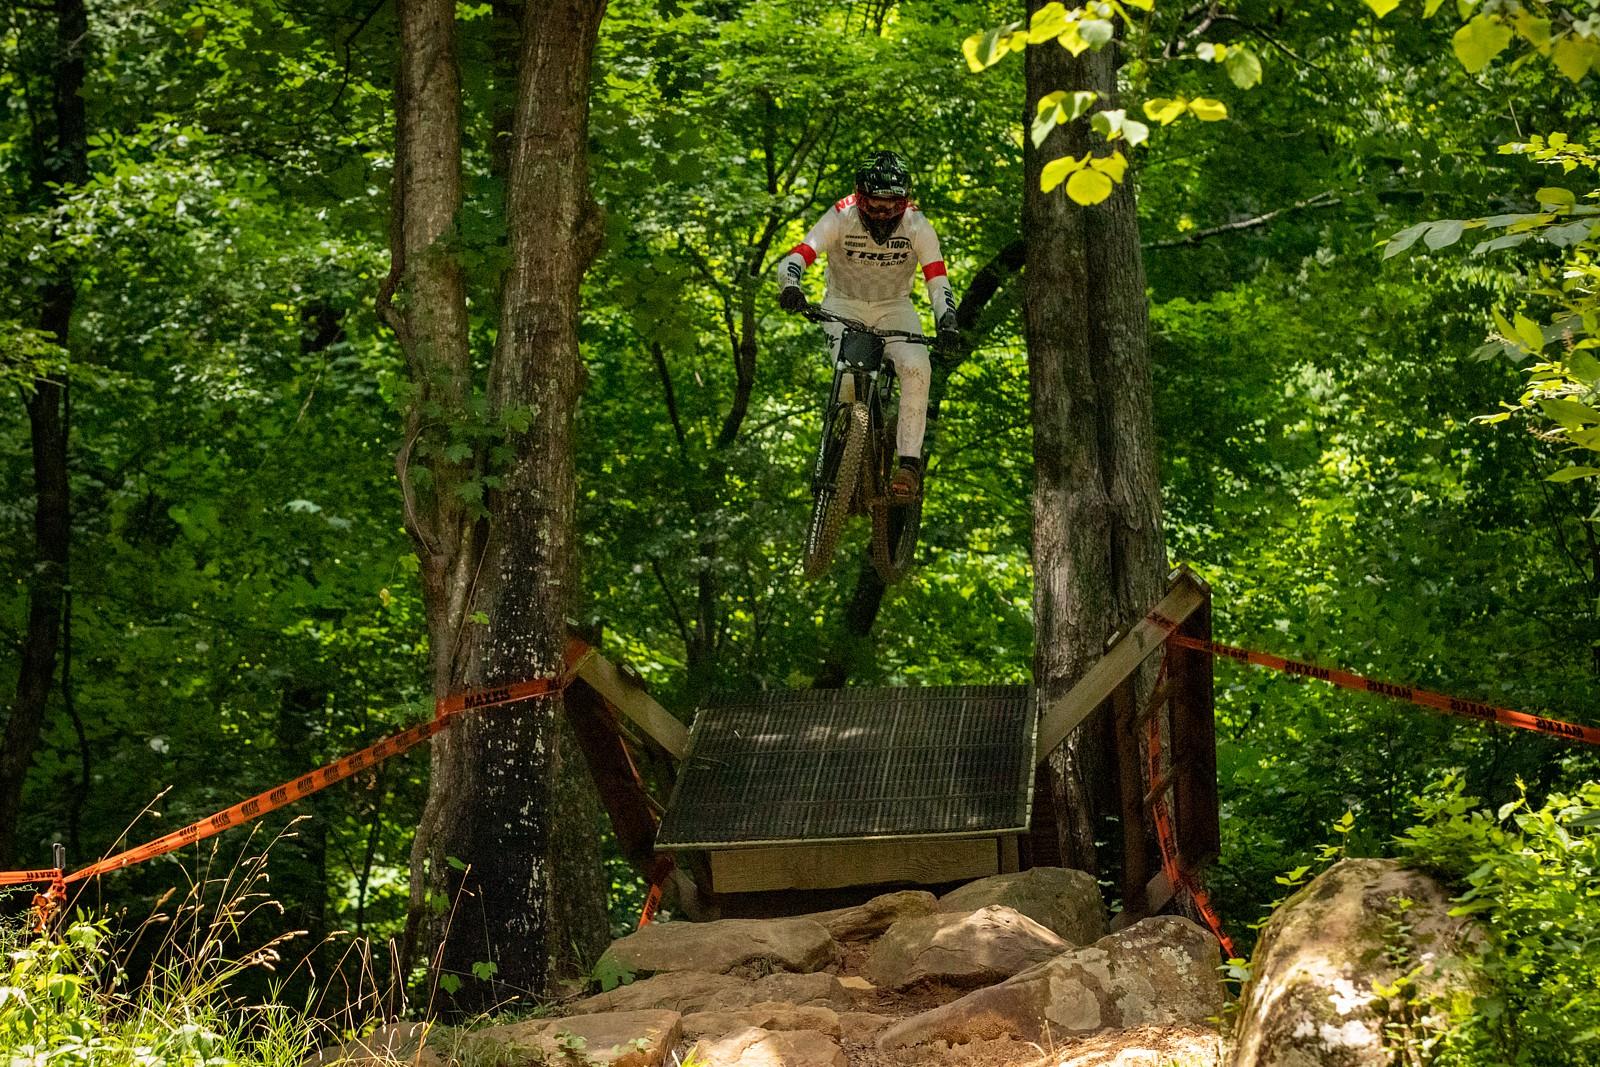 15 - JackRice - Mountain Biking Pictures - Vital MTB